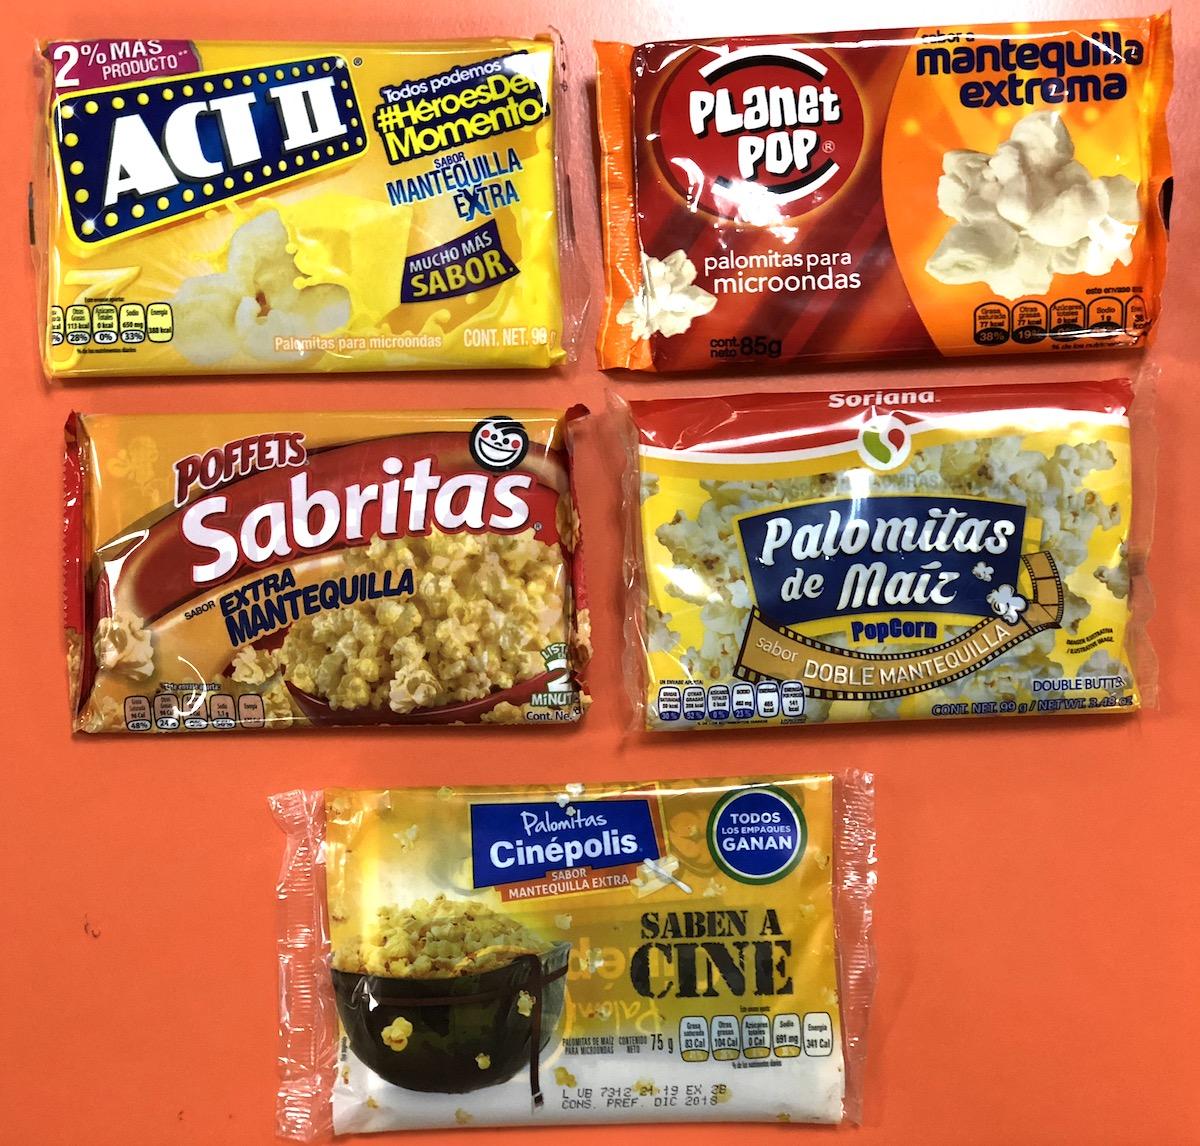 Palomitas Cinepolis vs otras marcas